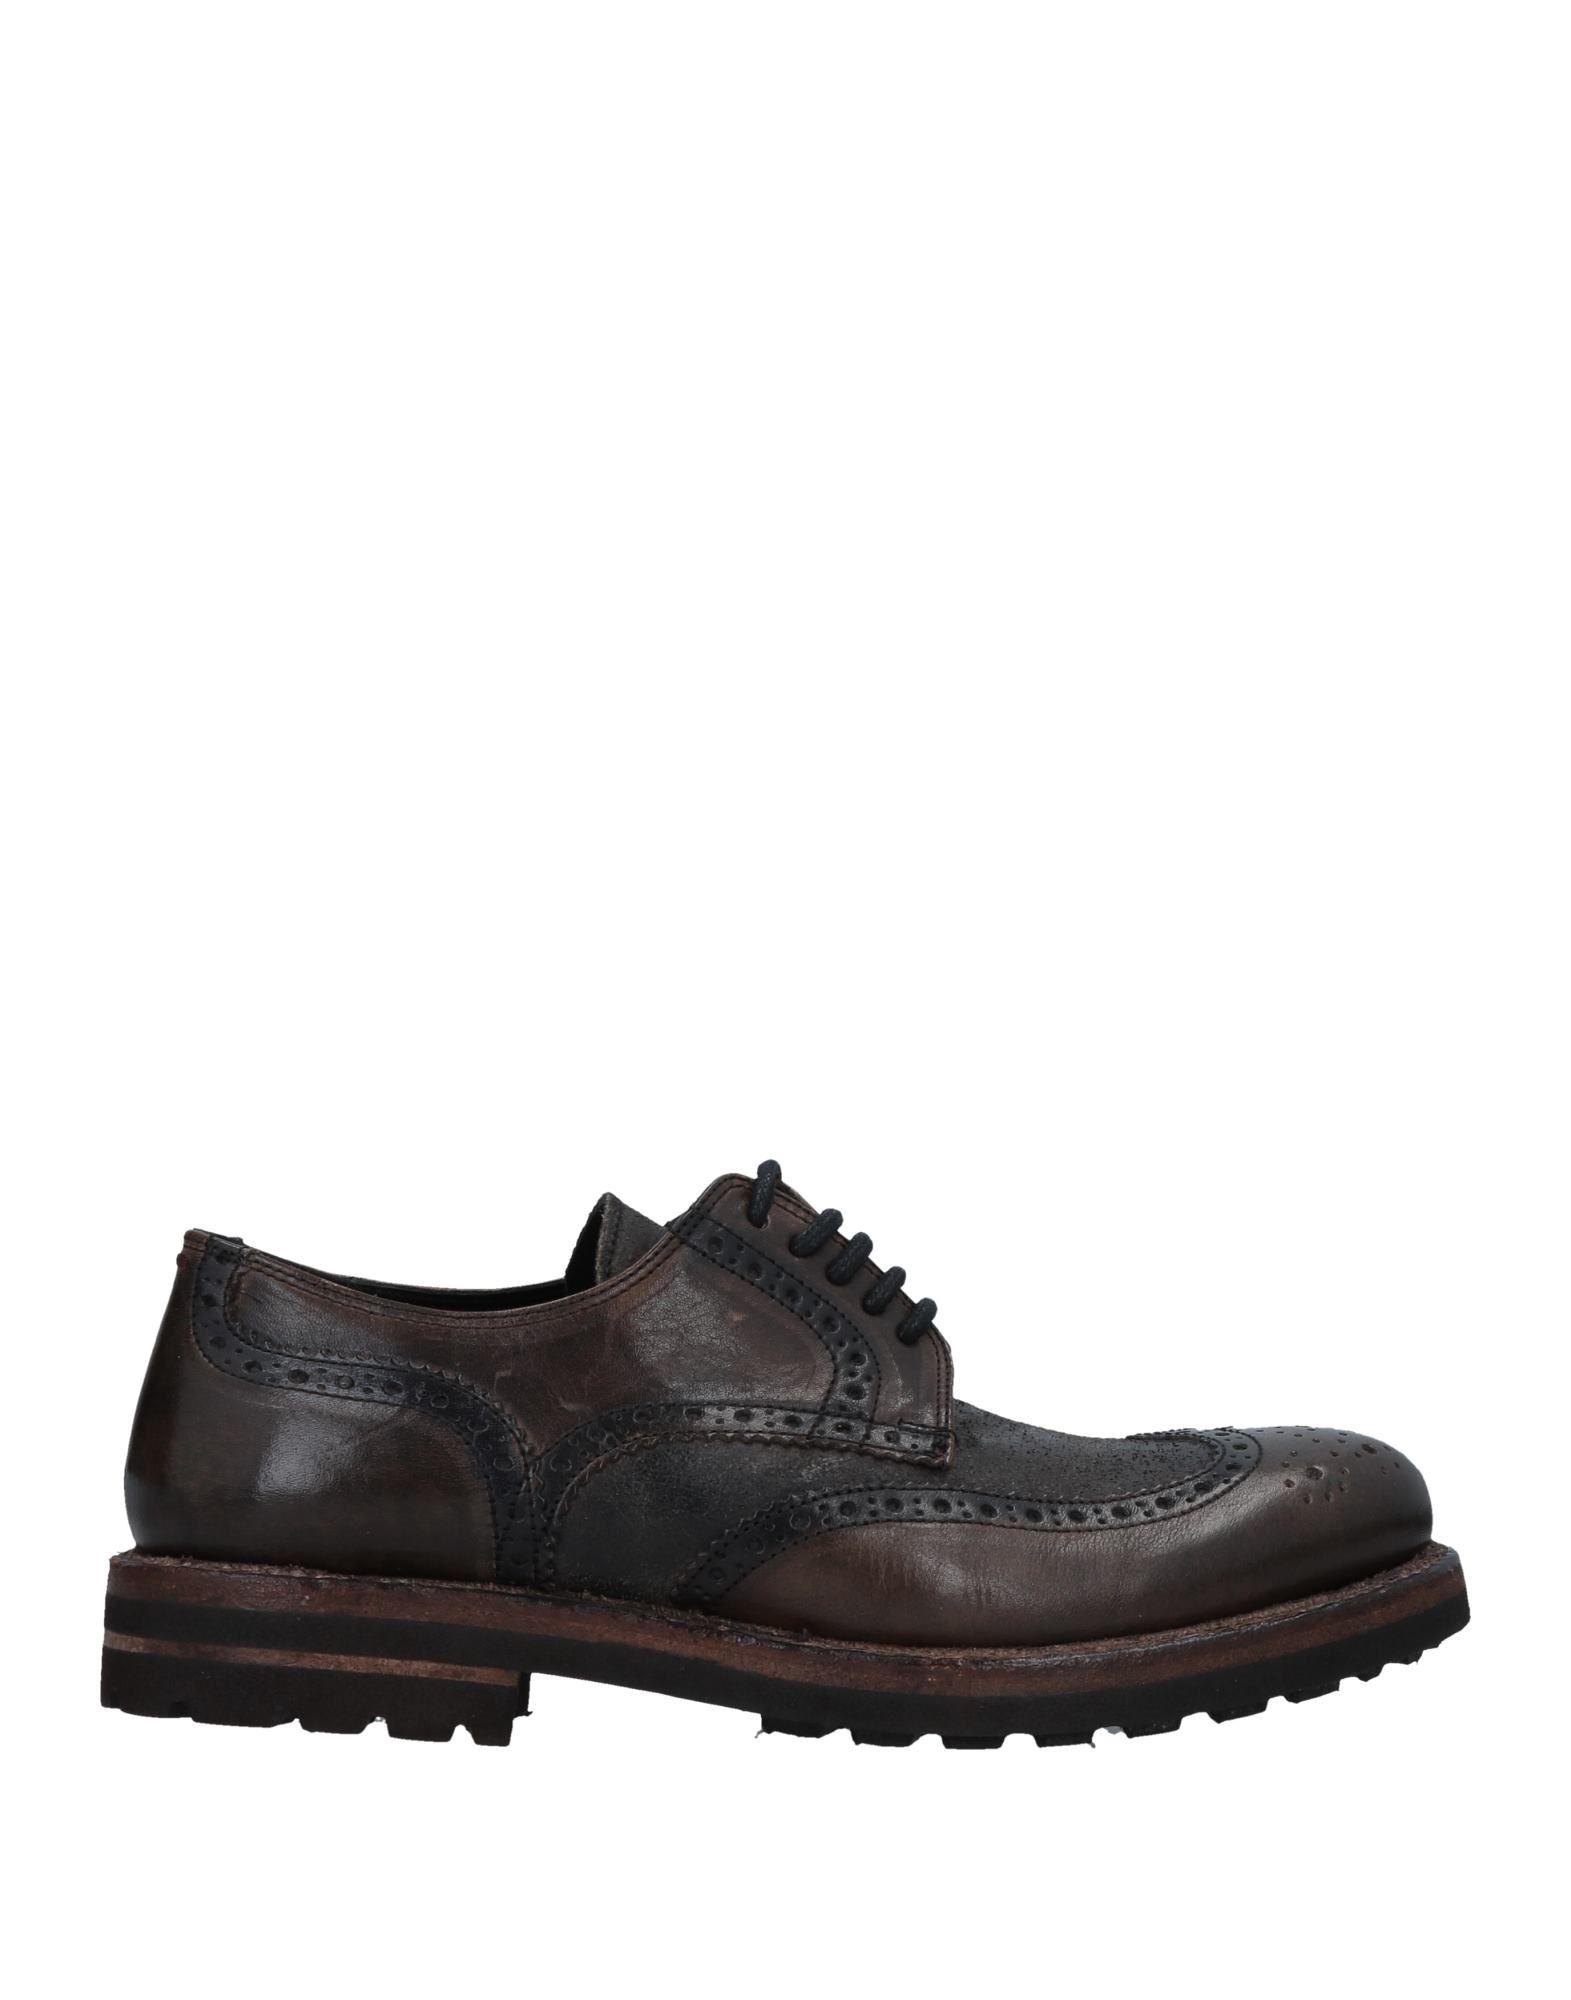 CAVALLINI Обувь на шнурках первый внутри обувь обувь обувь обувь обувь обувь обувь обувь обувь 8a2549 мужская армия green 40 метров